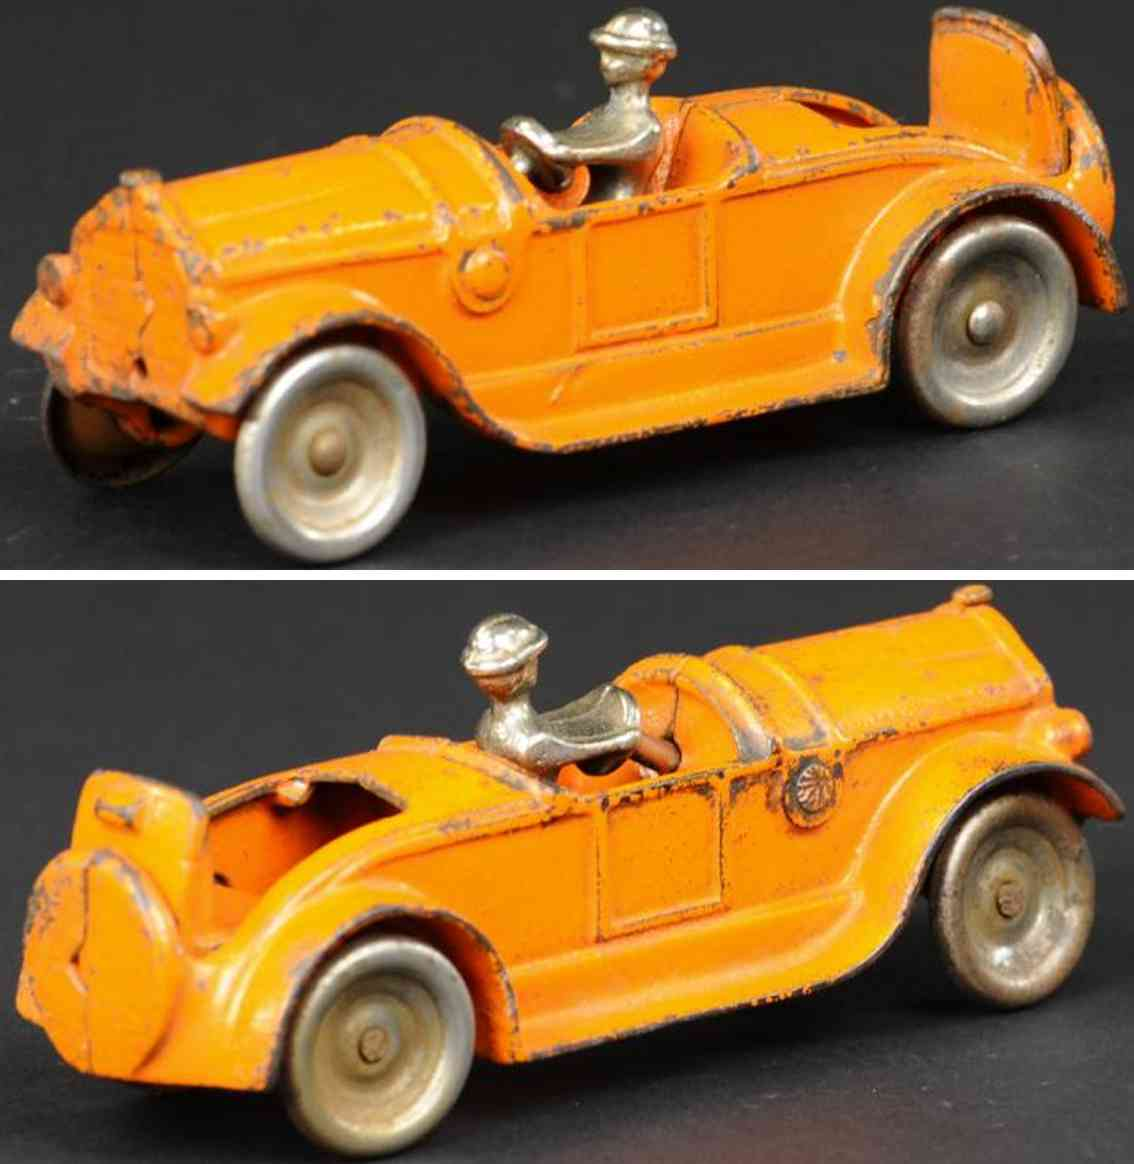 kilgore spielzeug gusseisen auto roadster offener notsitz orange